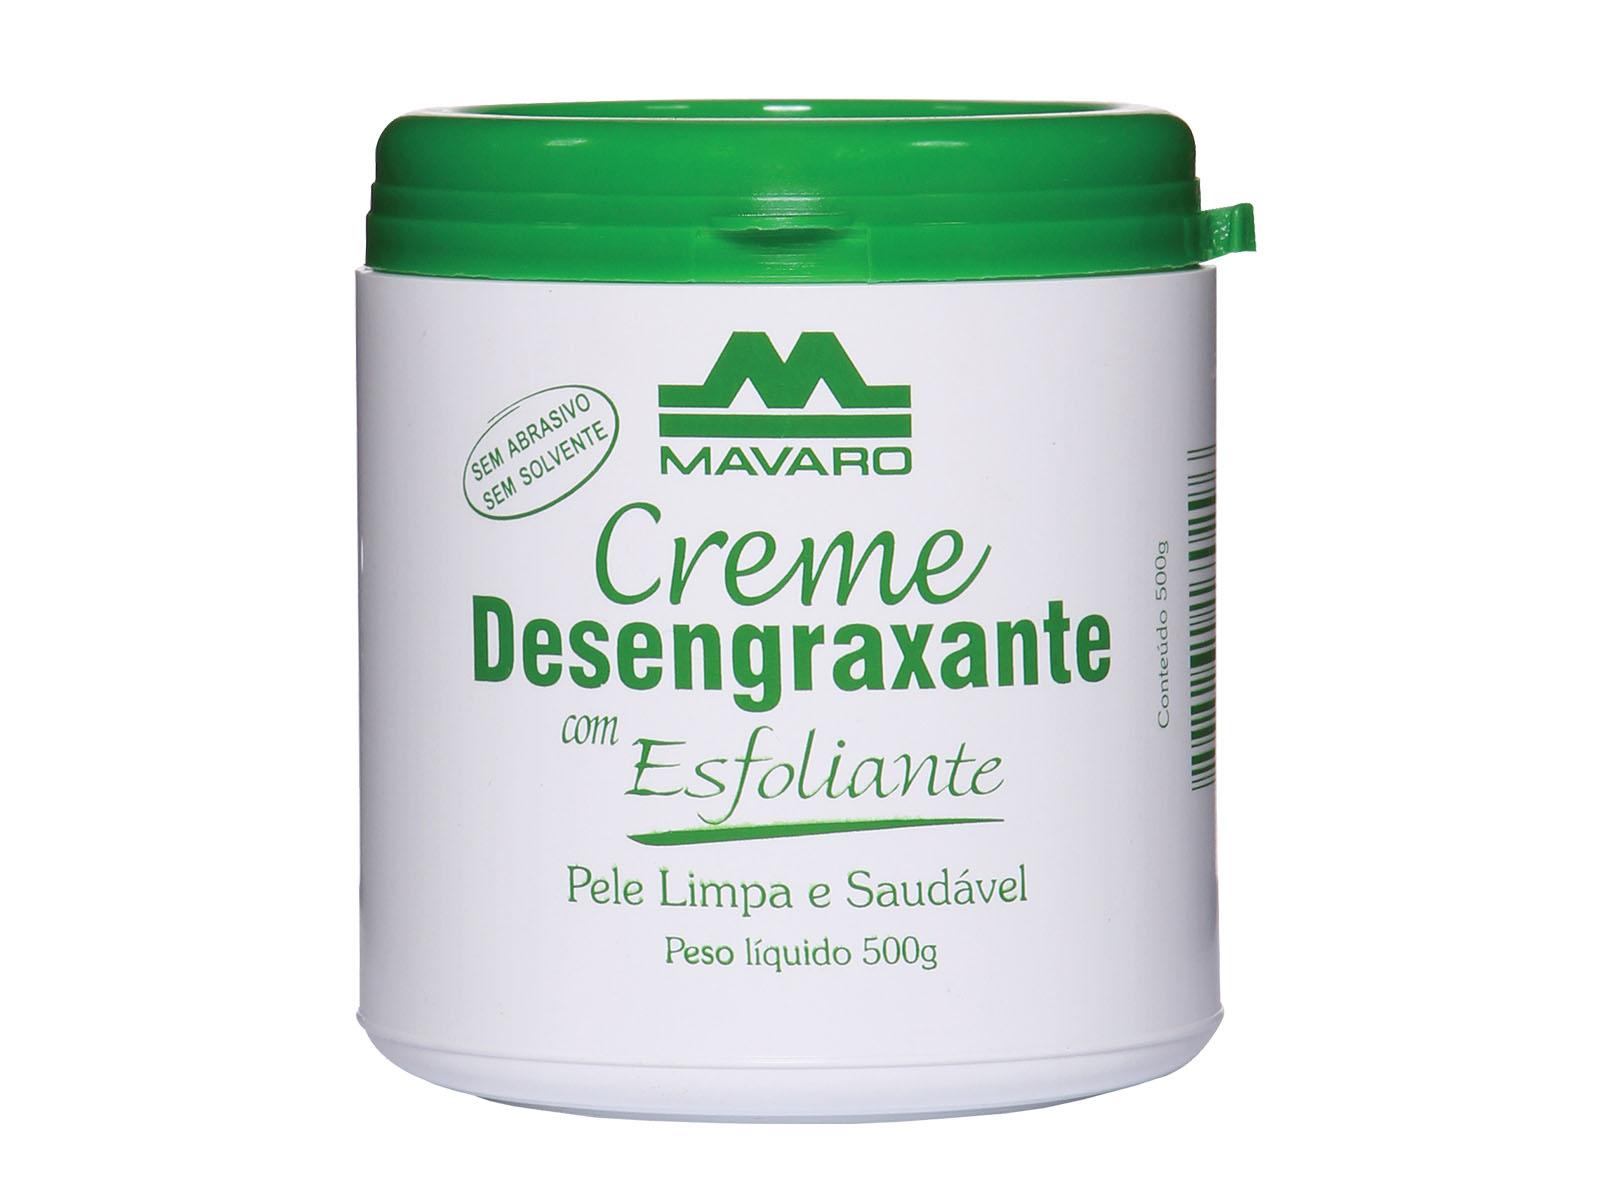 73fe4a255355c Creme desengraxante com esfoliante 500g – Cod 3317 – Seg-Labor